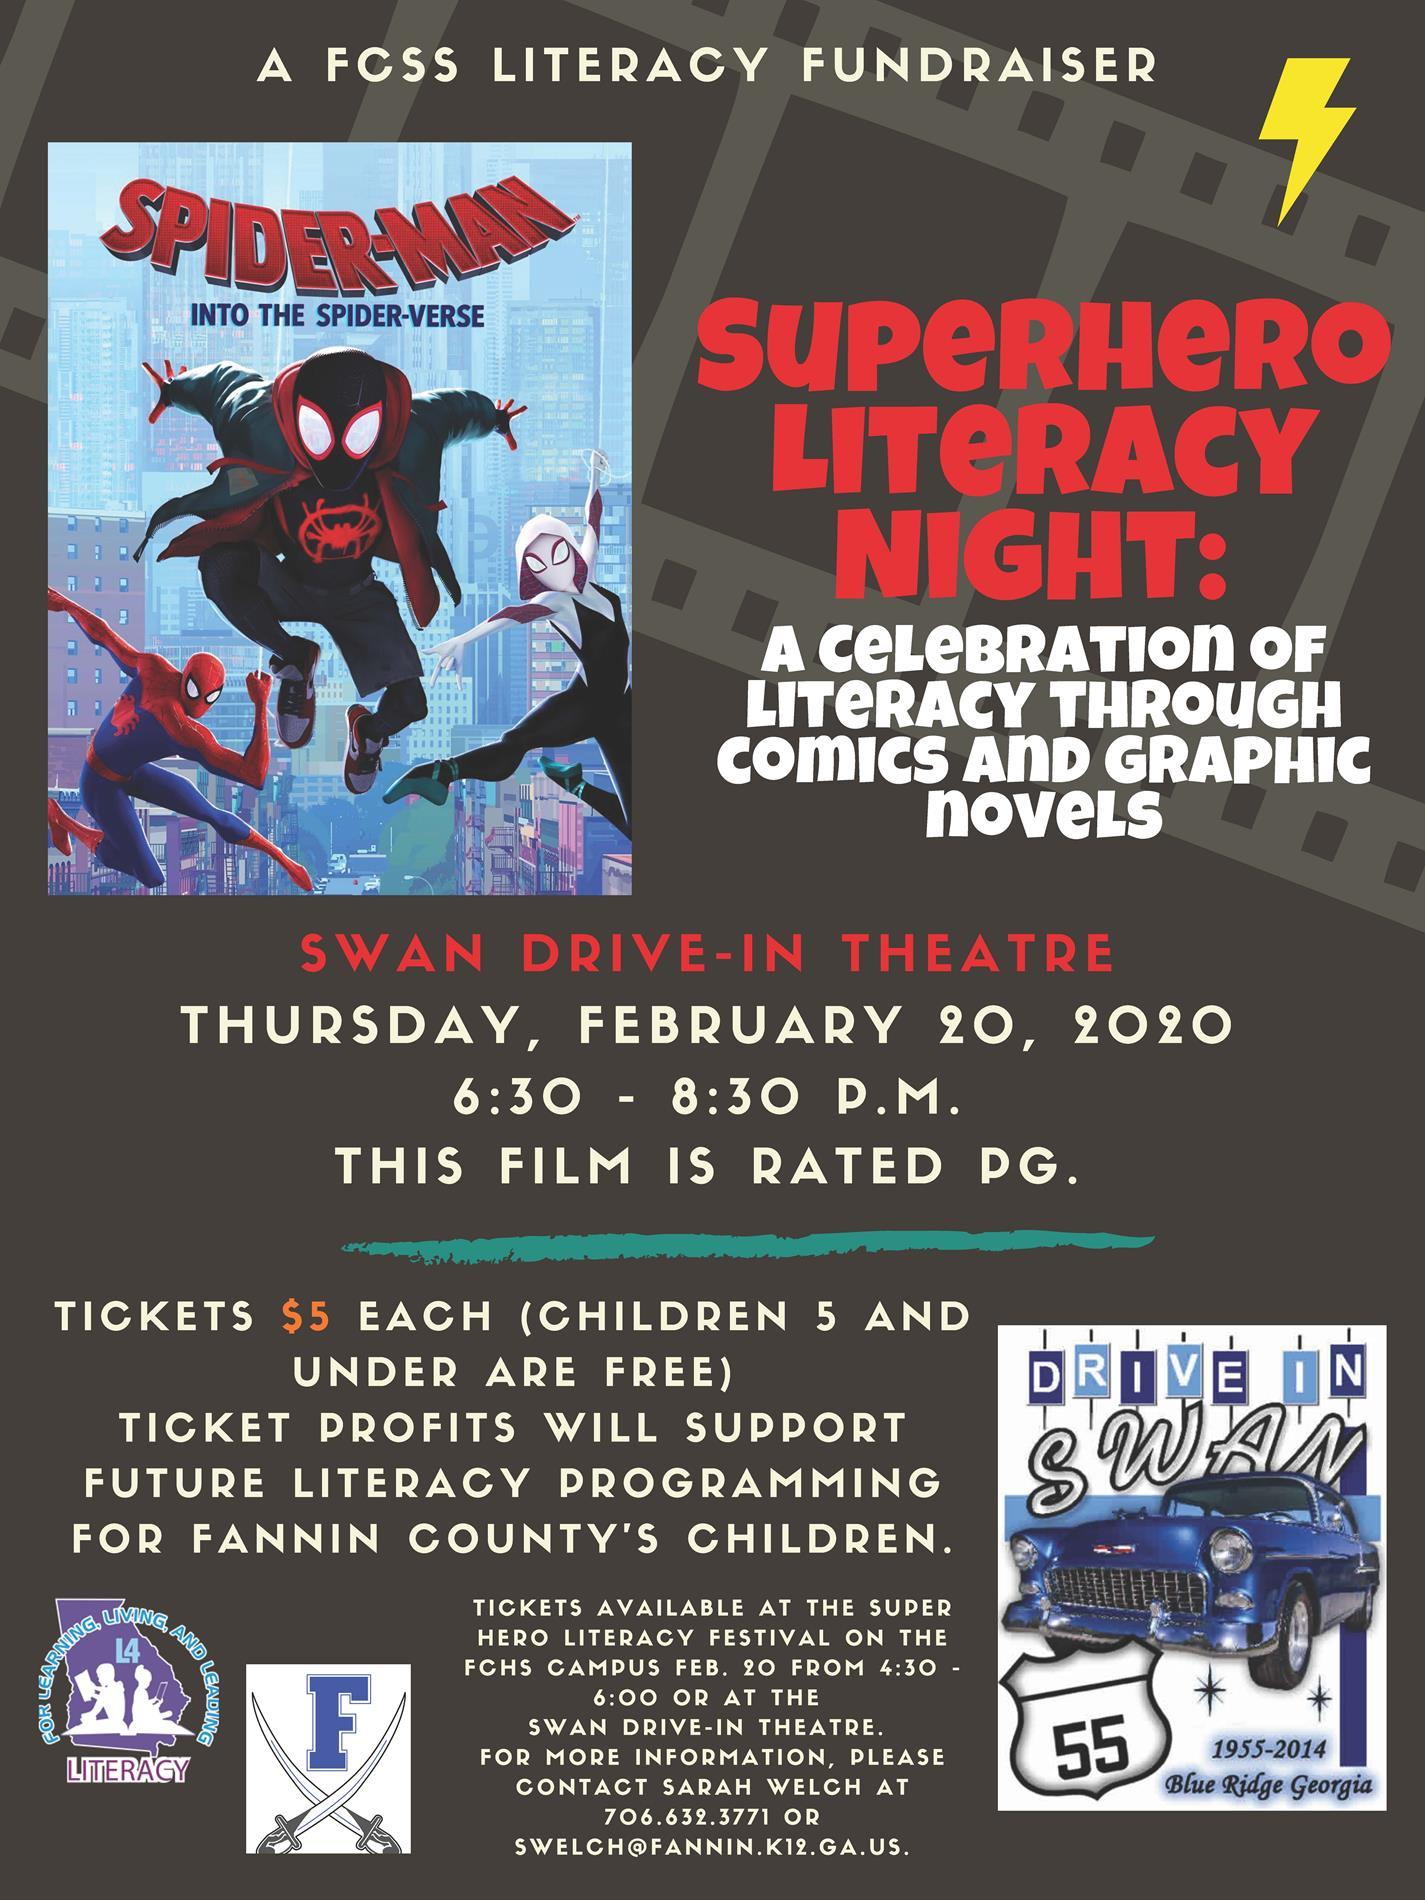 Superhero Literacy Night